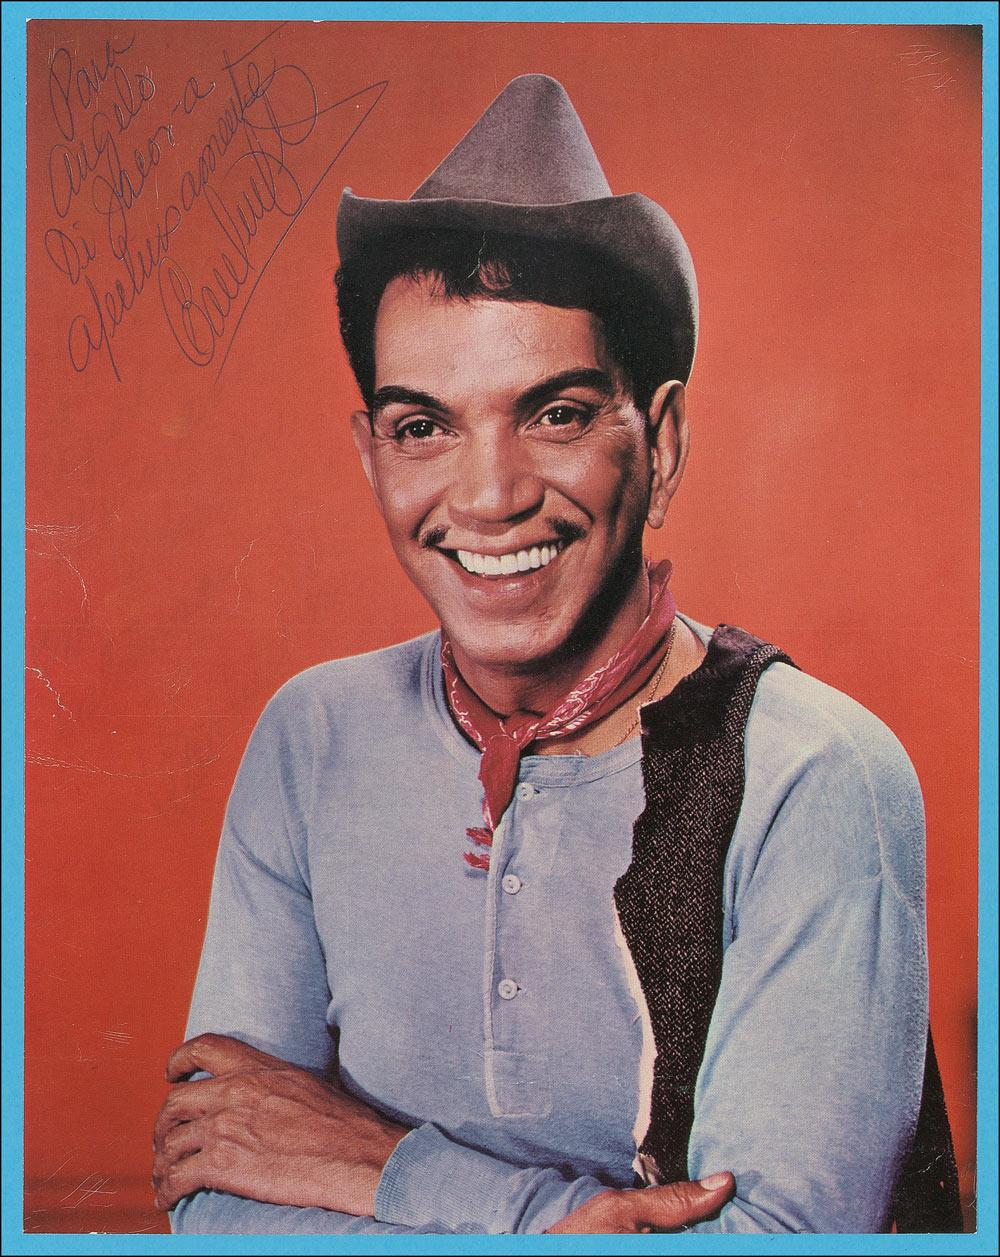 Cantinflas Coleccion de Peliculas completa Latino Hd Mega